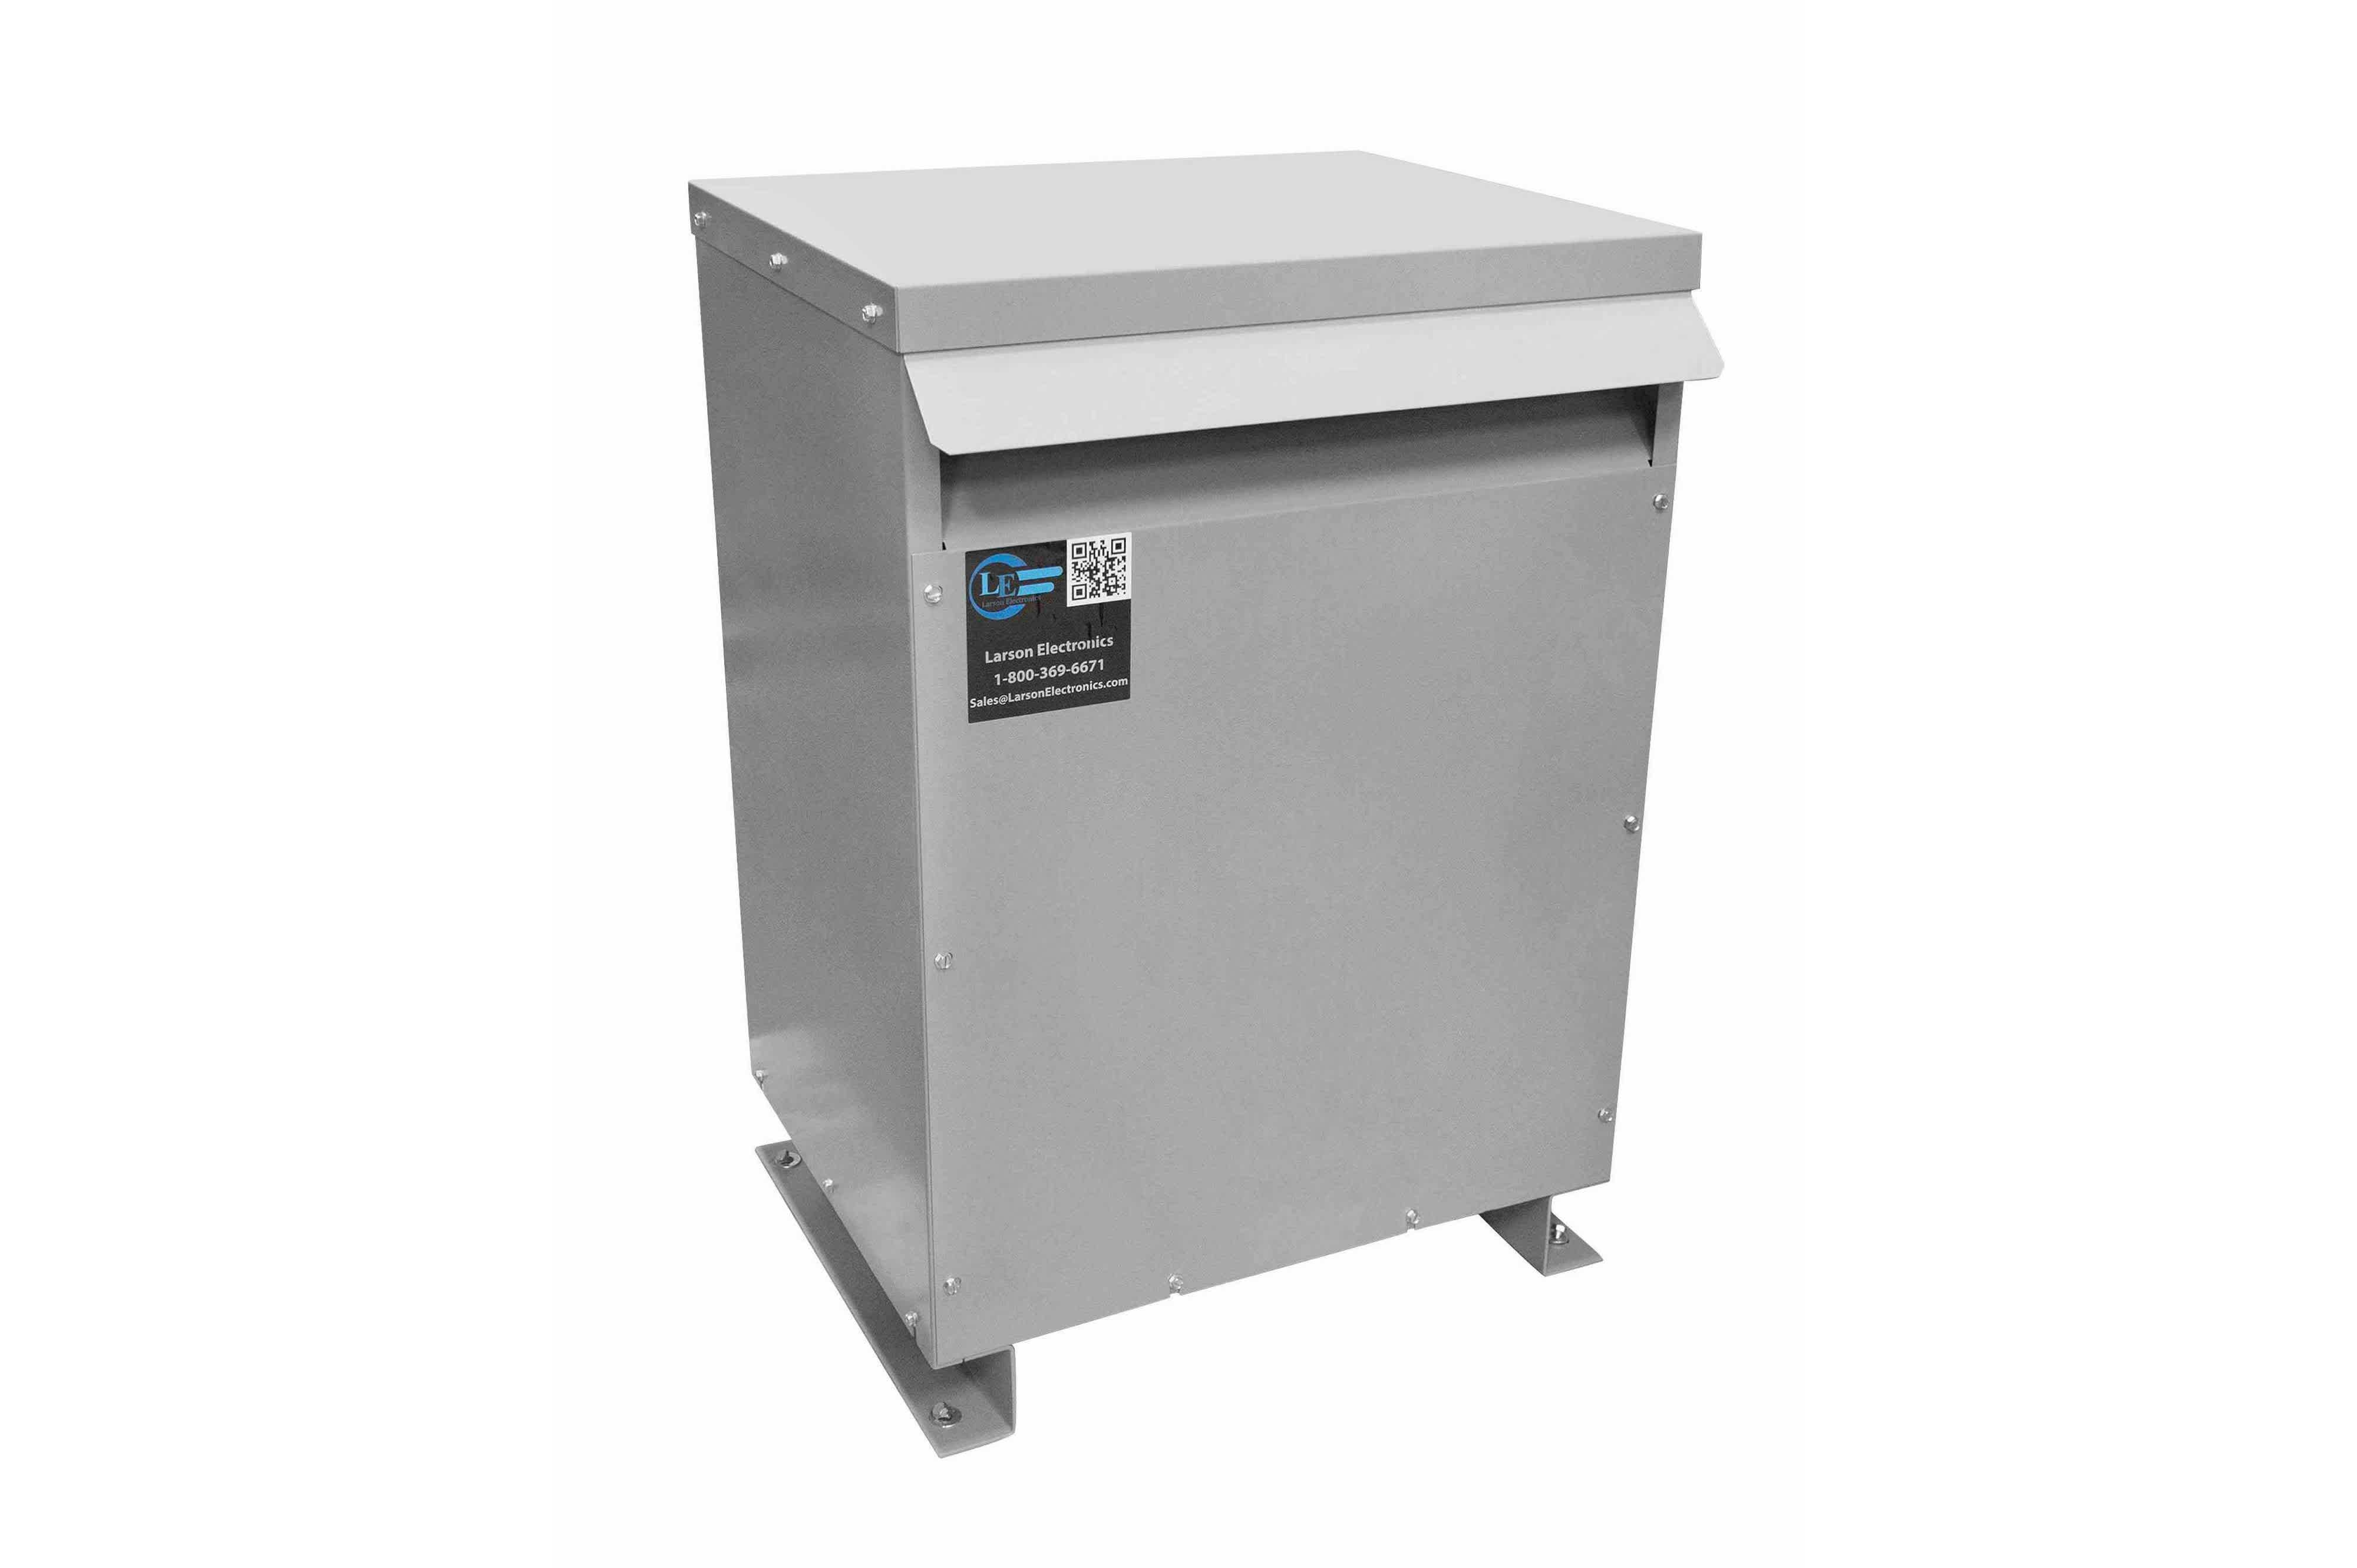 75 kVA 3PH Isolation Transformer, 575V Wye Primary, 208Y/120 Wye-N Secondary, N3R, Ventilated, 60 Hz